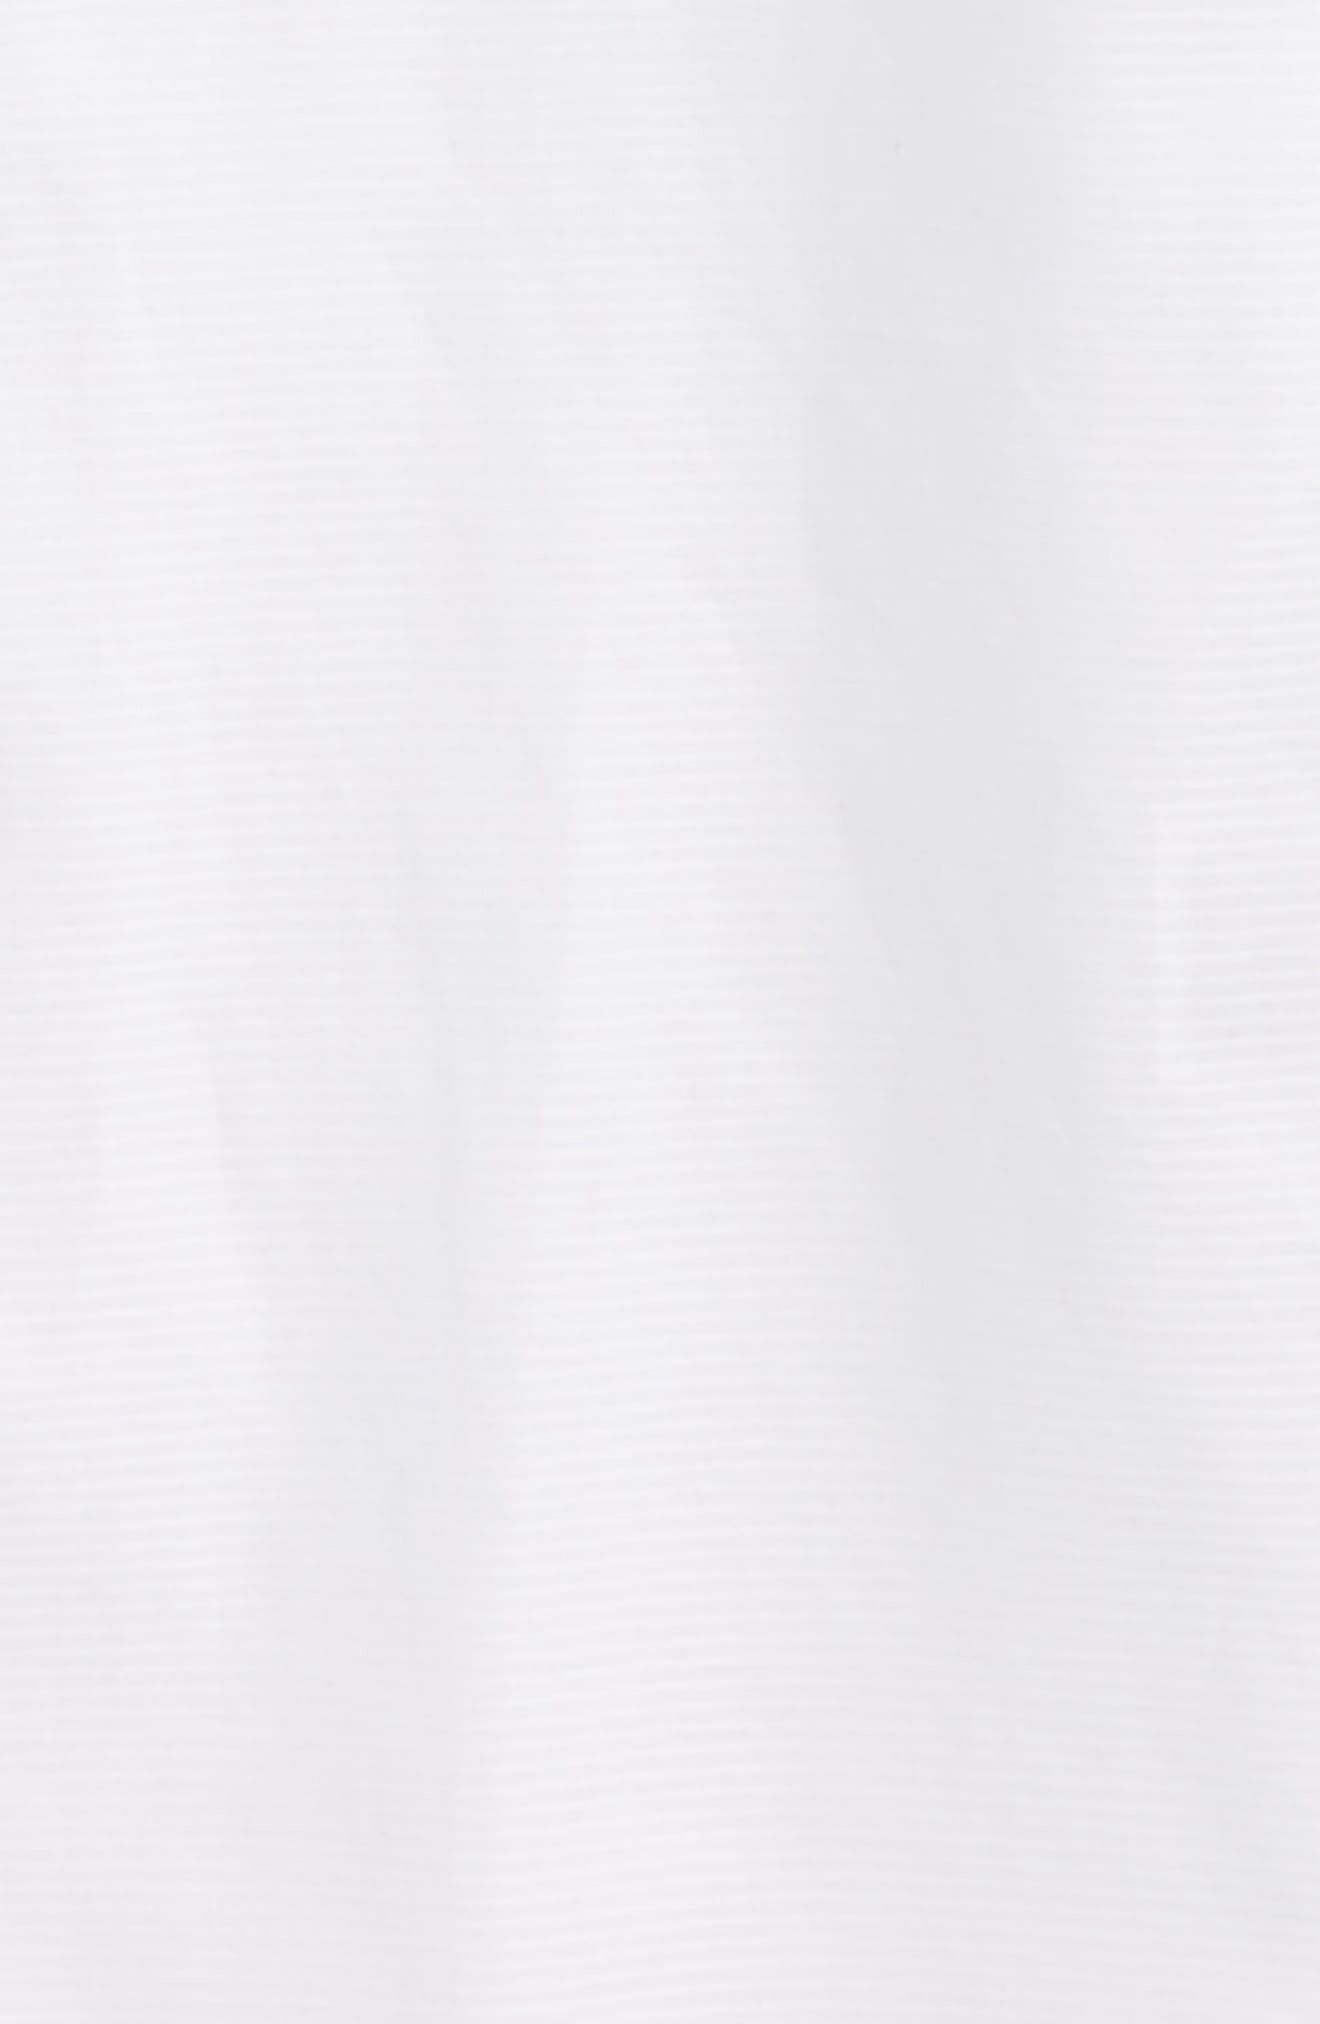 MICHAEL KORS, Solid Dress Shirt, Alternate thumbnail 2, color, WHITE